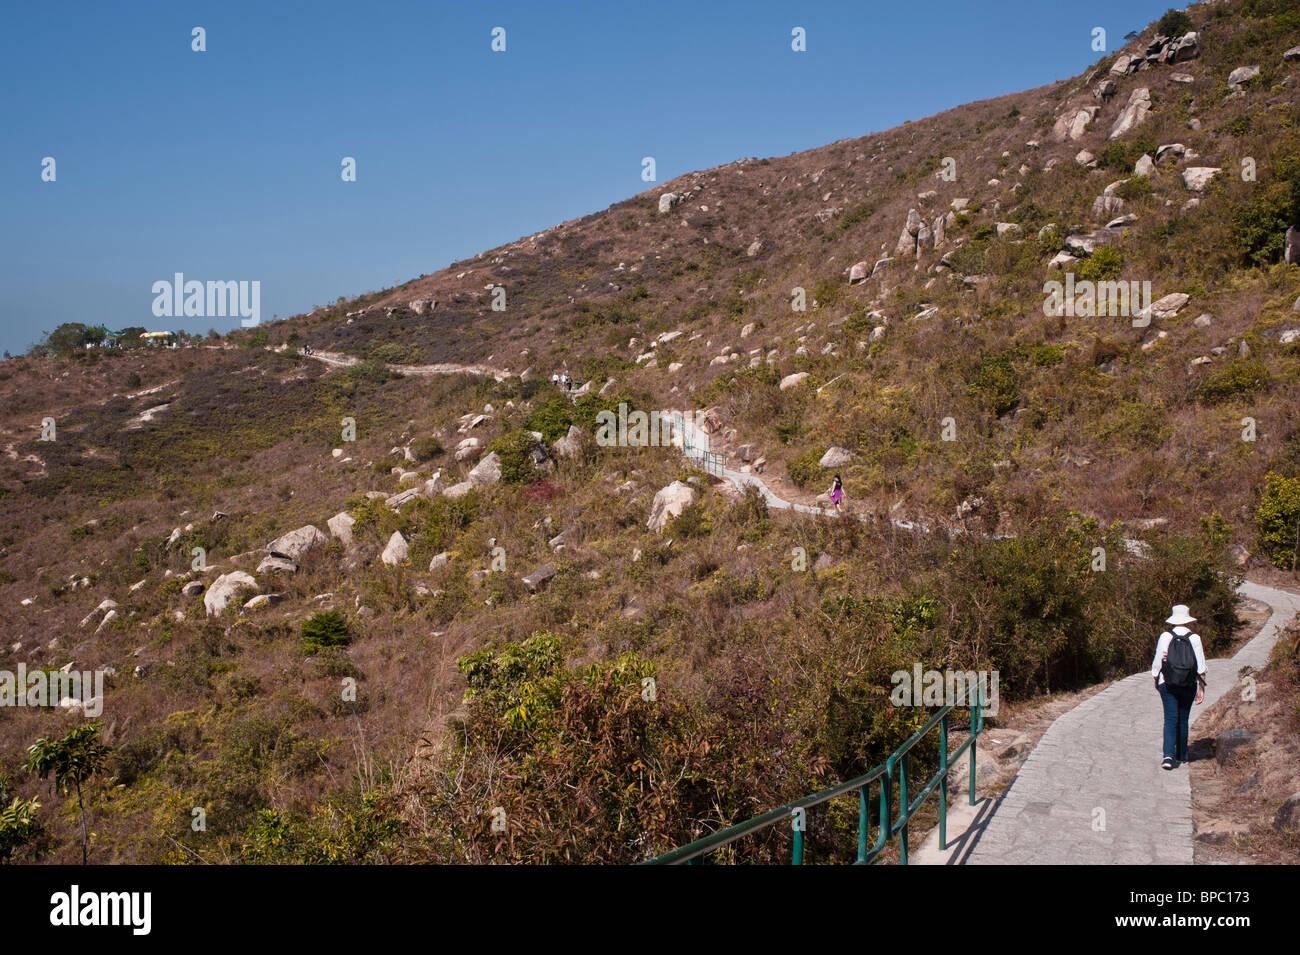 Hong Kong, The Lamma Family trail. Walk from Yung Shu Wan to Sok Kwu Wan through the hills and along the beaches. - Stock Image